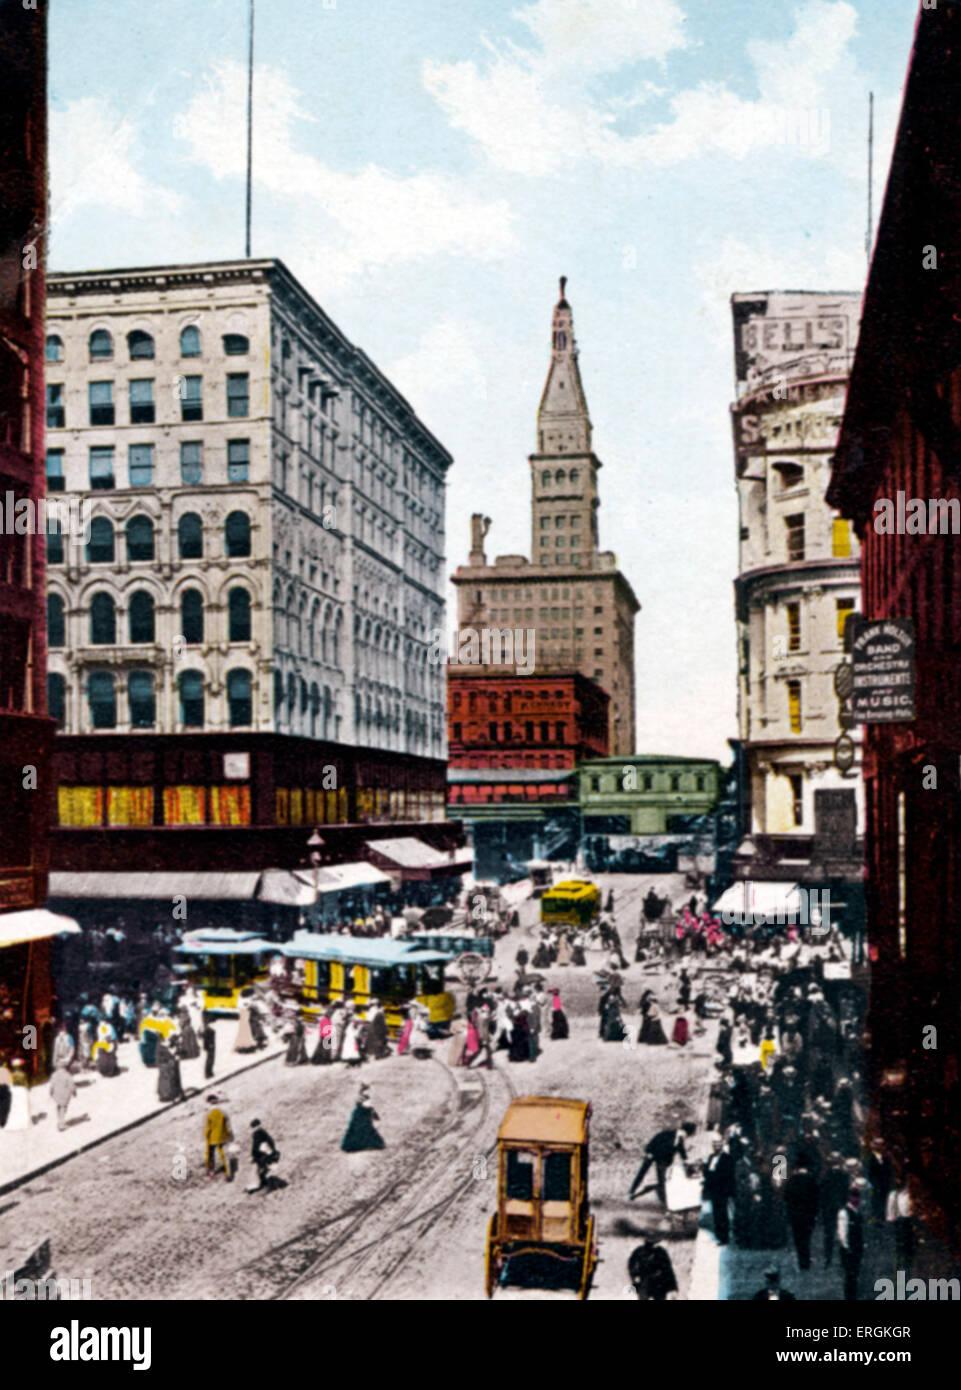 Chicago, Illinois, USA - Madison Street East, early twentieth century. Tramways, tramway.  Tinted photograph. - Stock Image